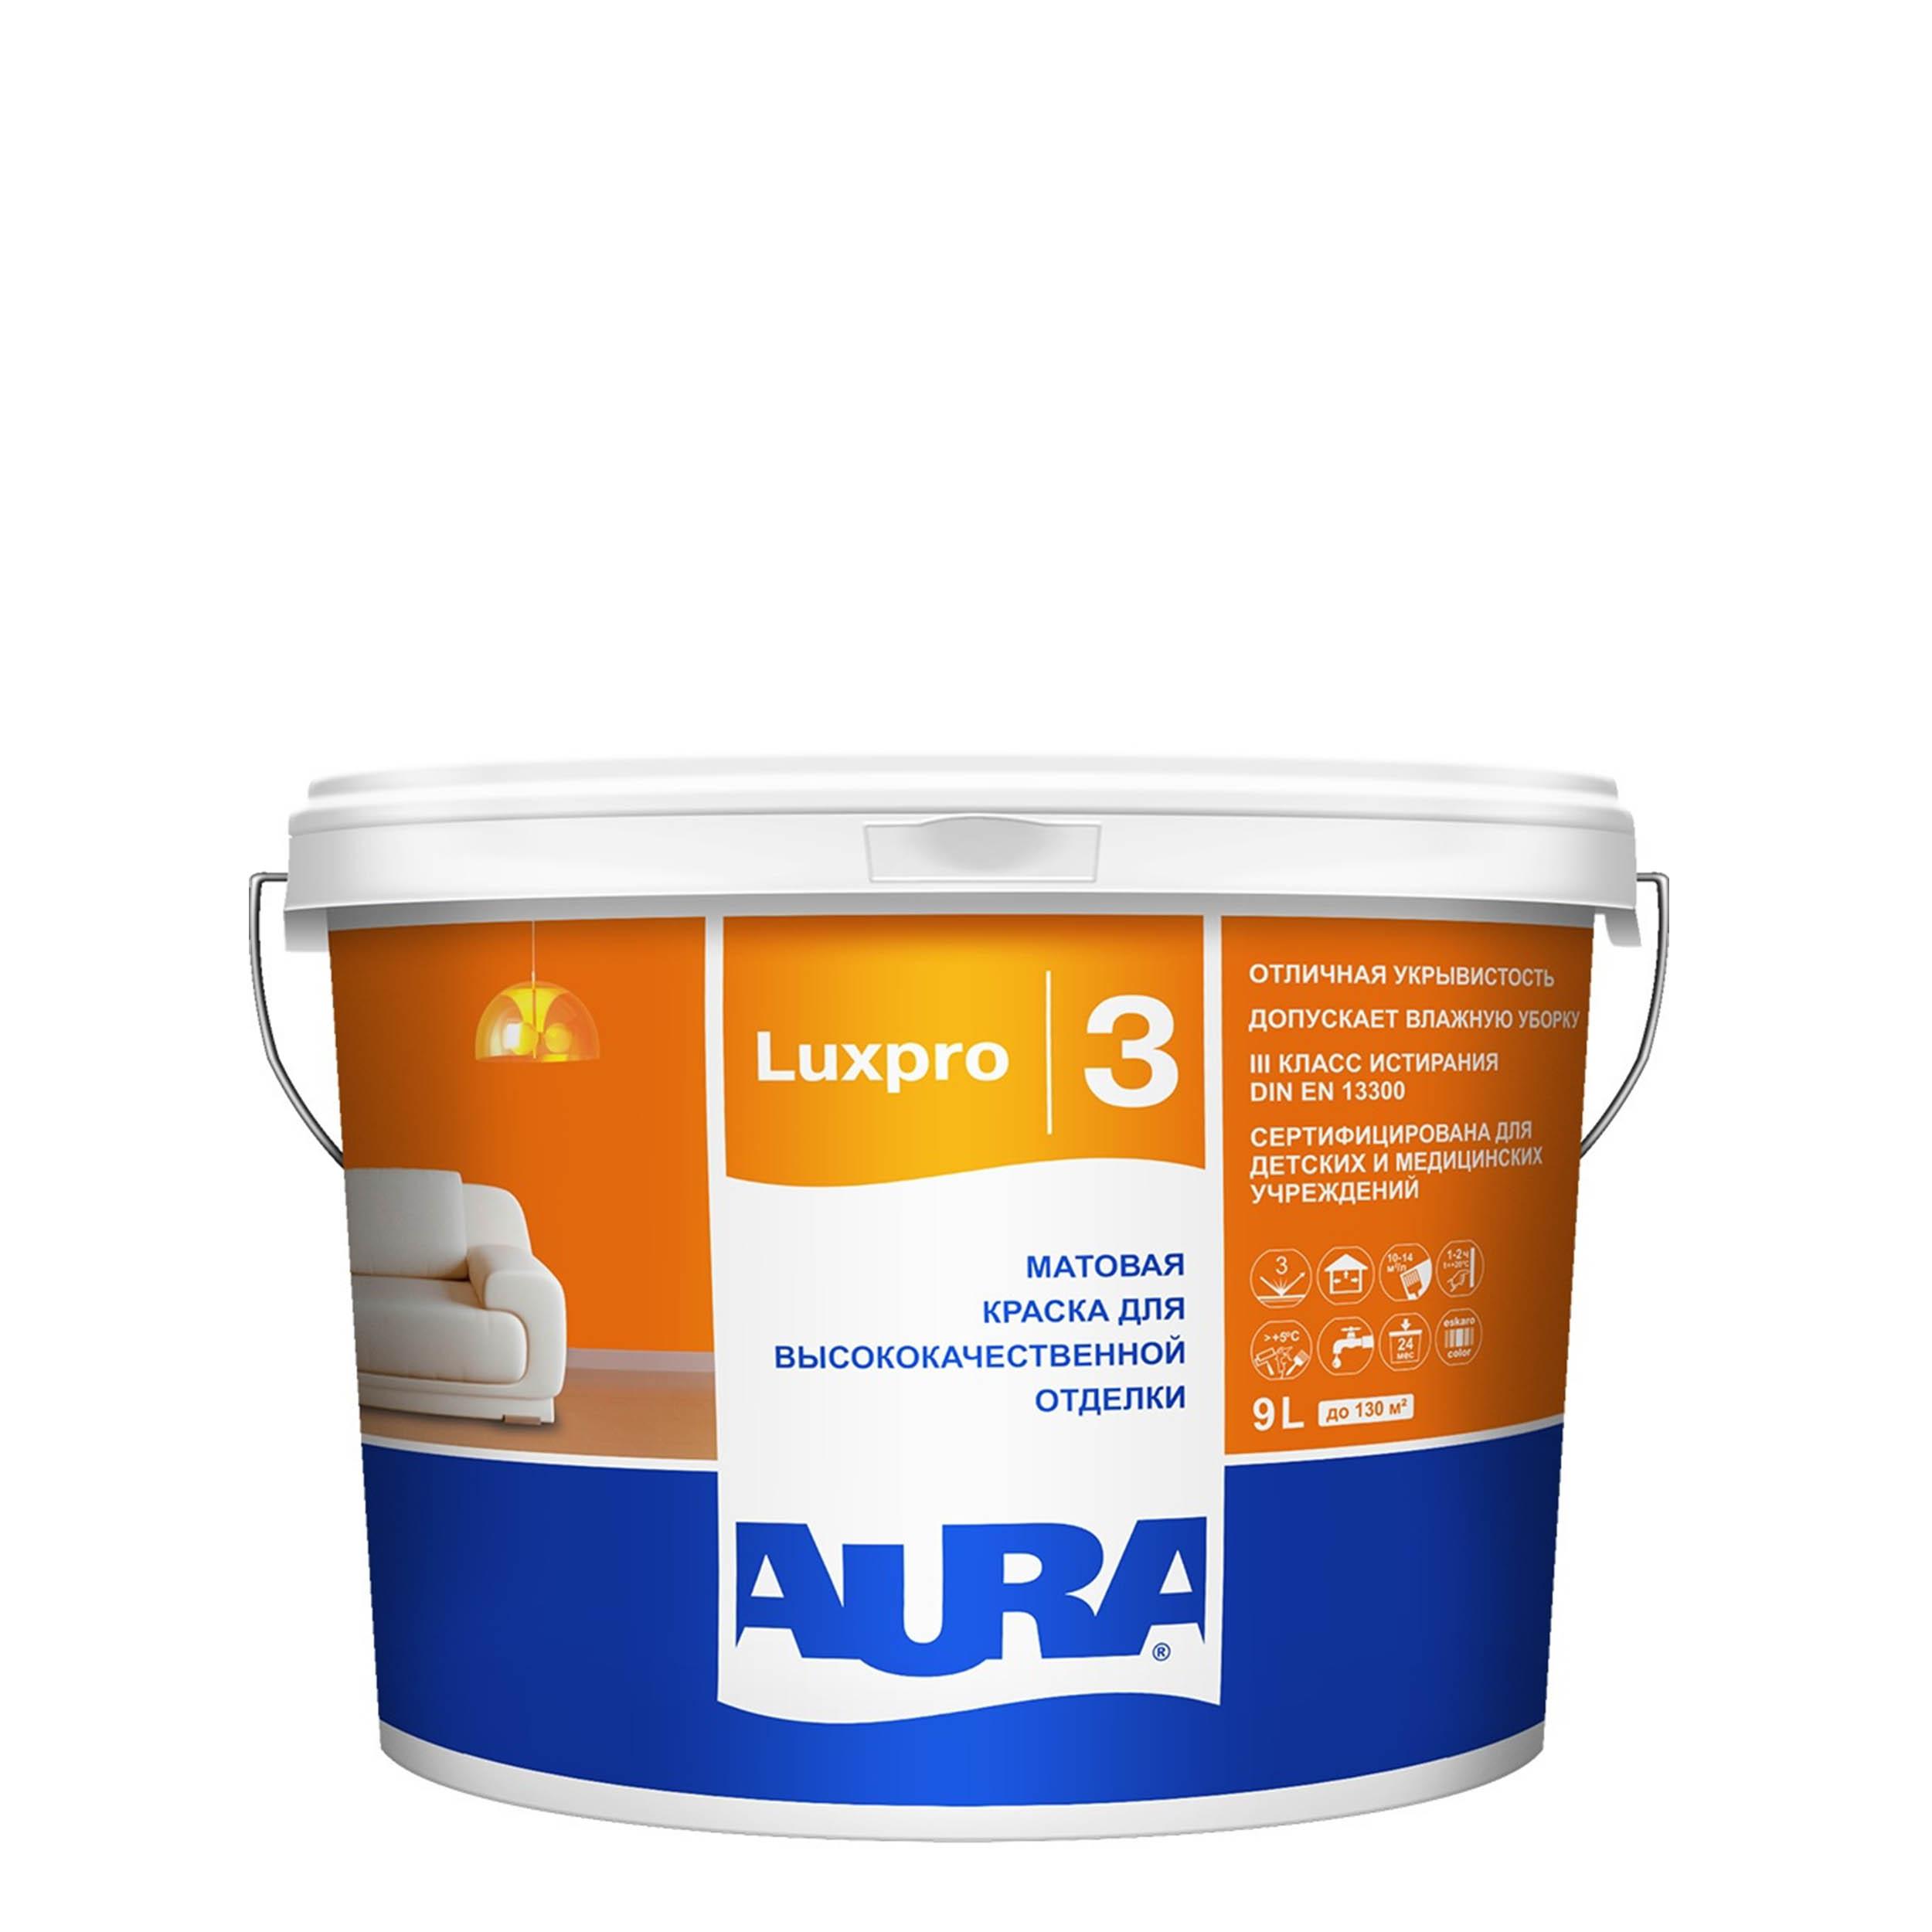 Фото 20 - Краска интерьерная, Aura LuxPRO 3, RAL 1023, 11 кг.